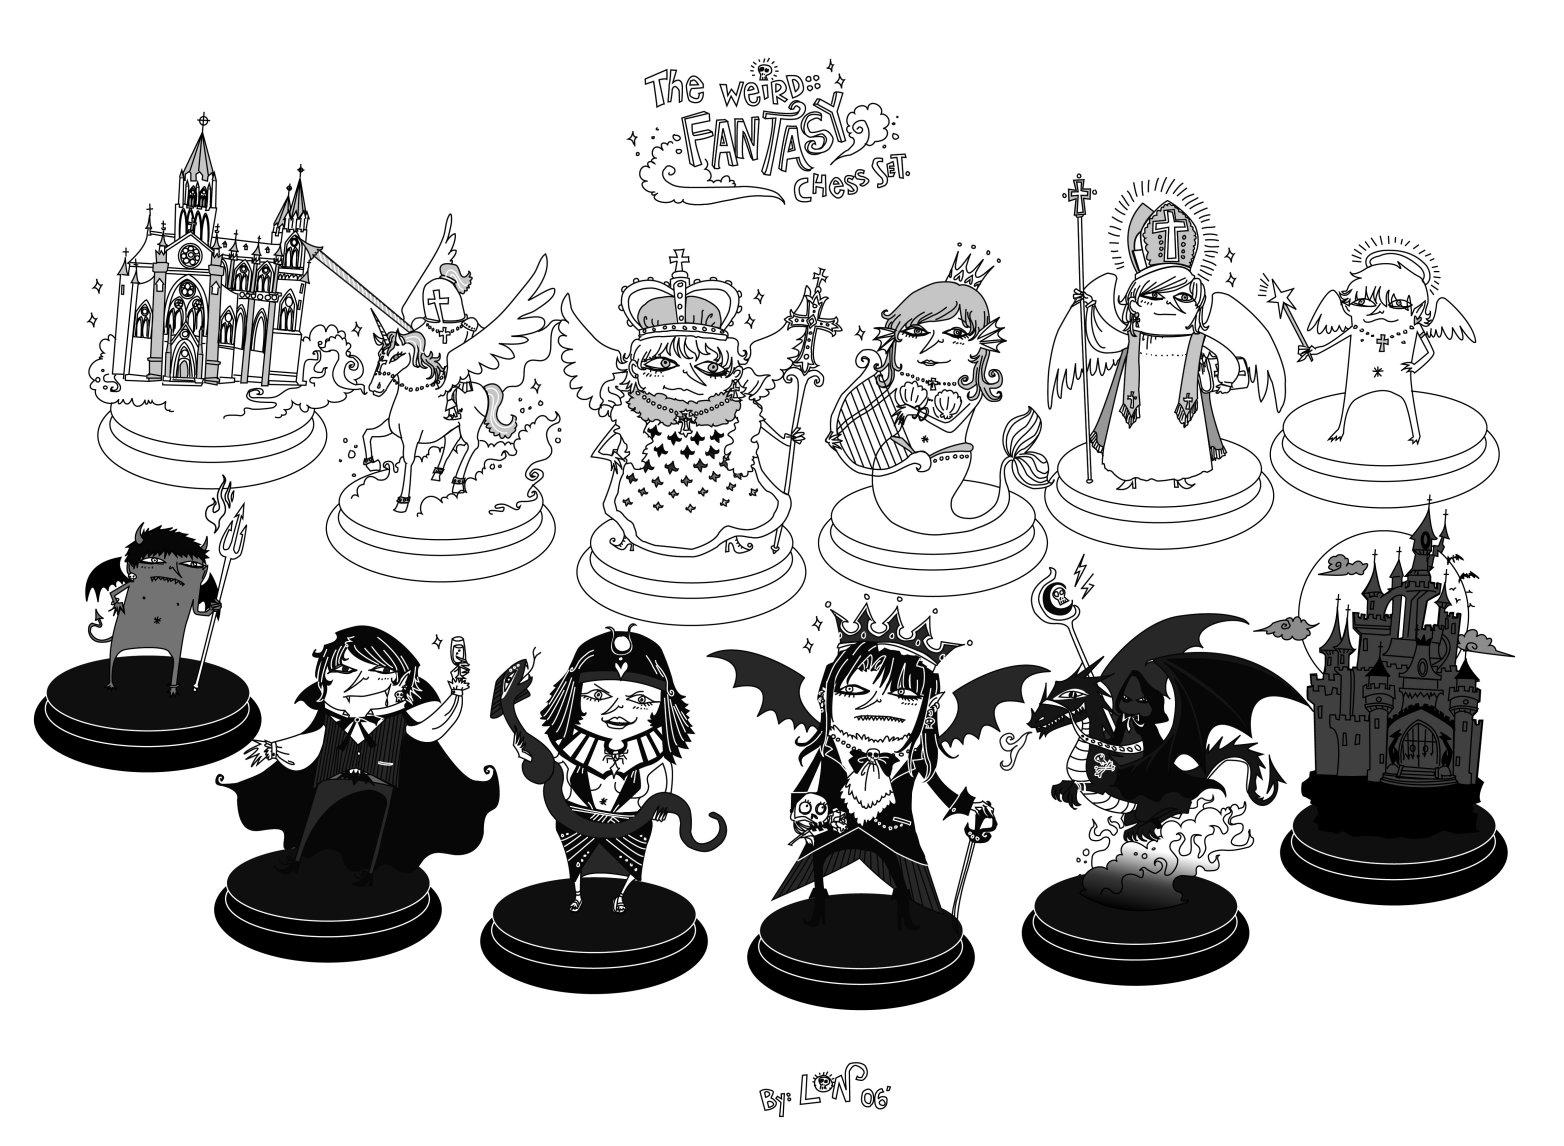 1564x1146 Weird Fantasy Chess Set By Monochrome Clown